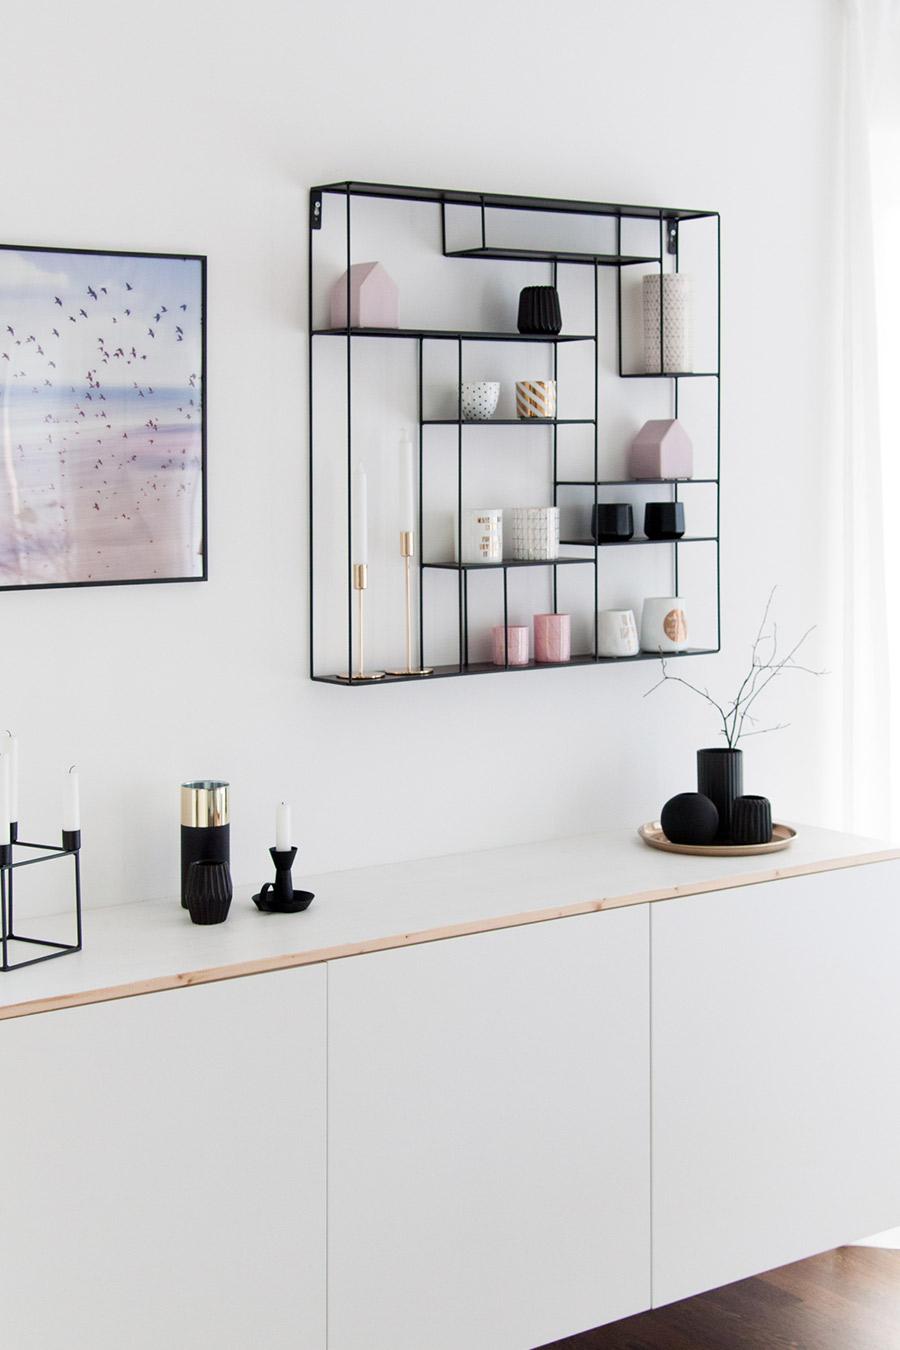 Ikea Besta wandhängend, Wandregal Bruka Design